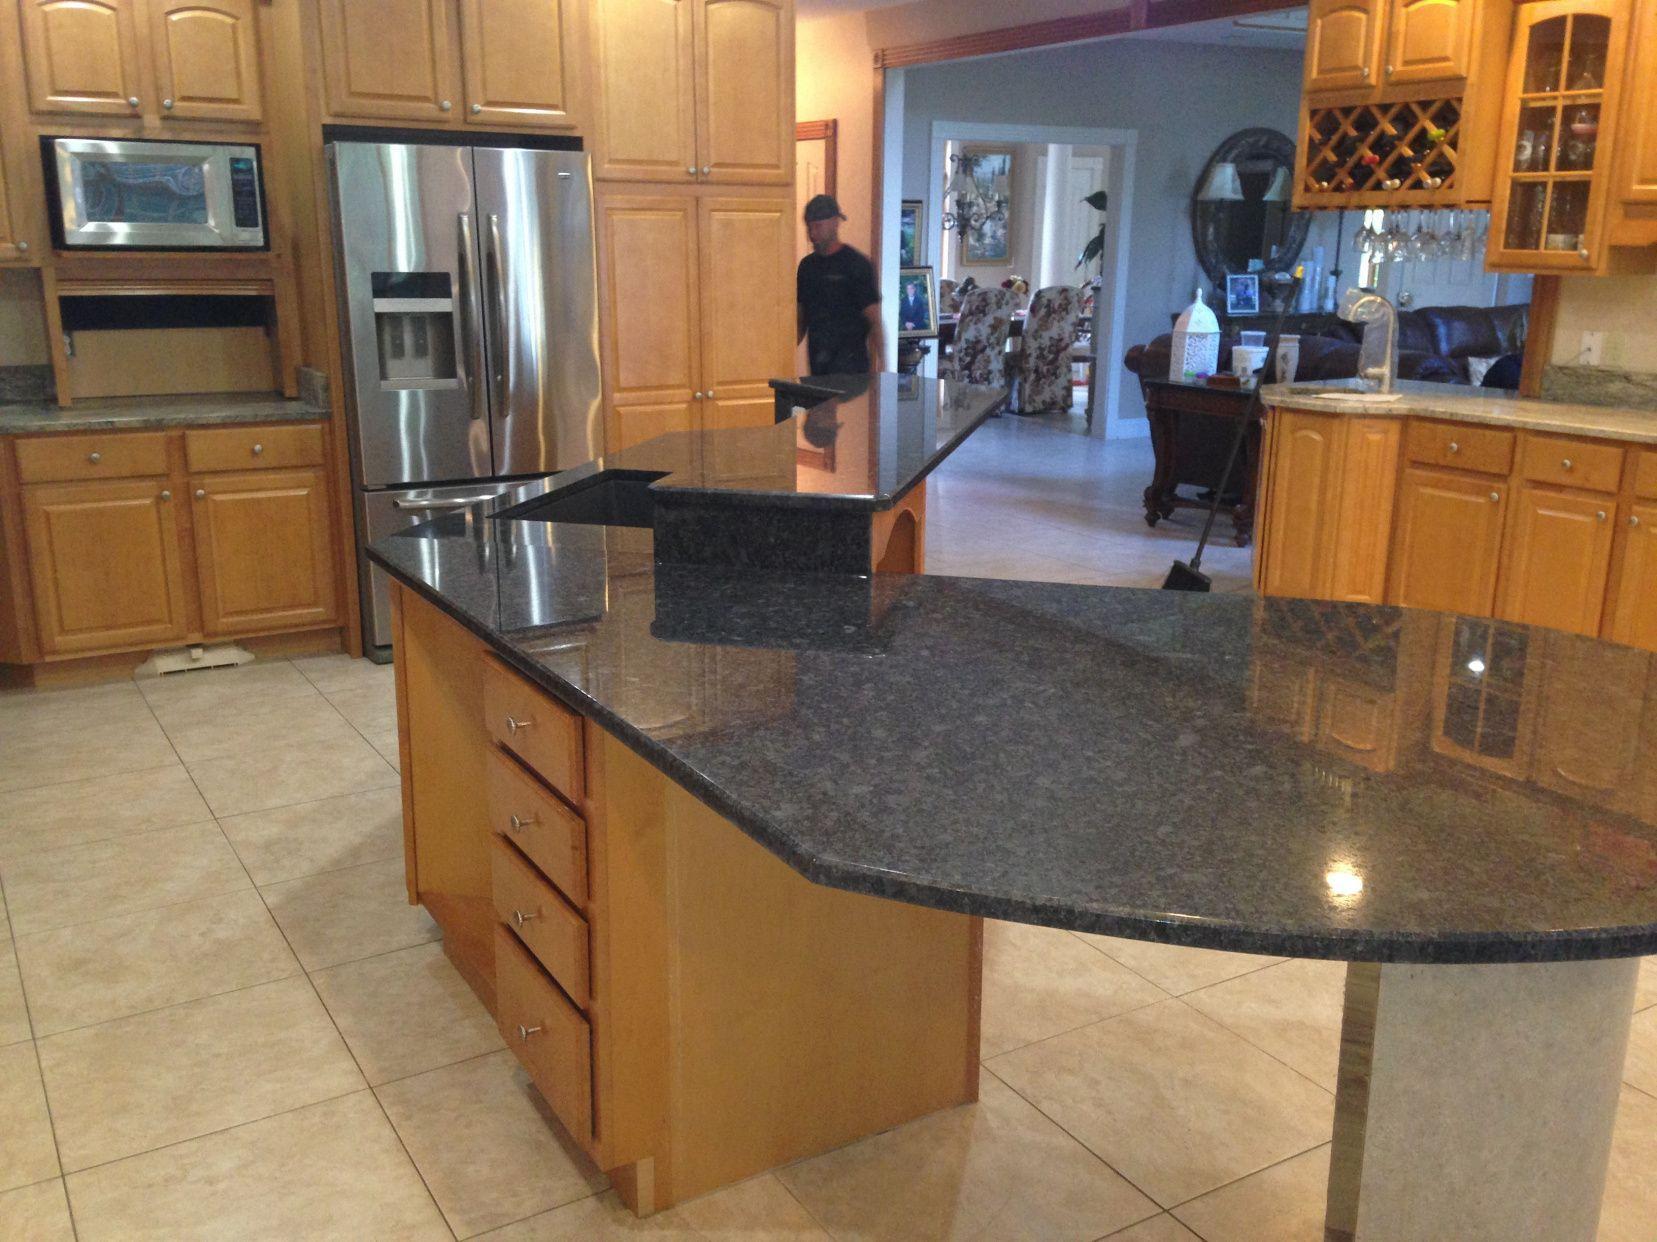 70 Granite Countertops Toledo Ohio Kitchen Cabinet Lighting Ideas Check More At Http